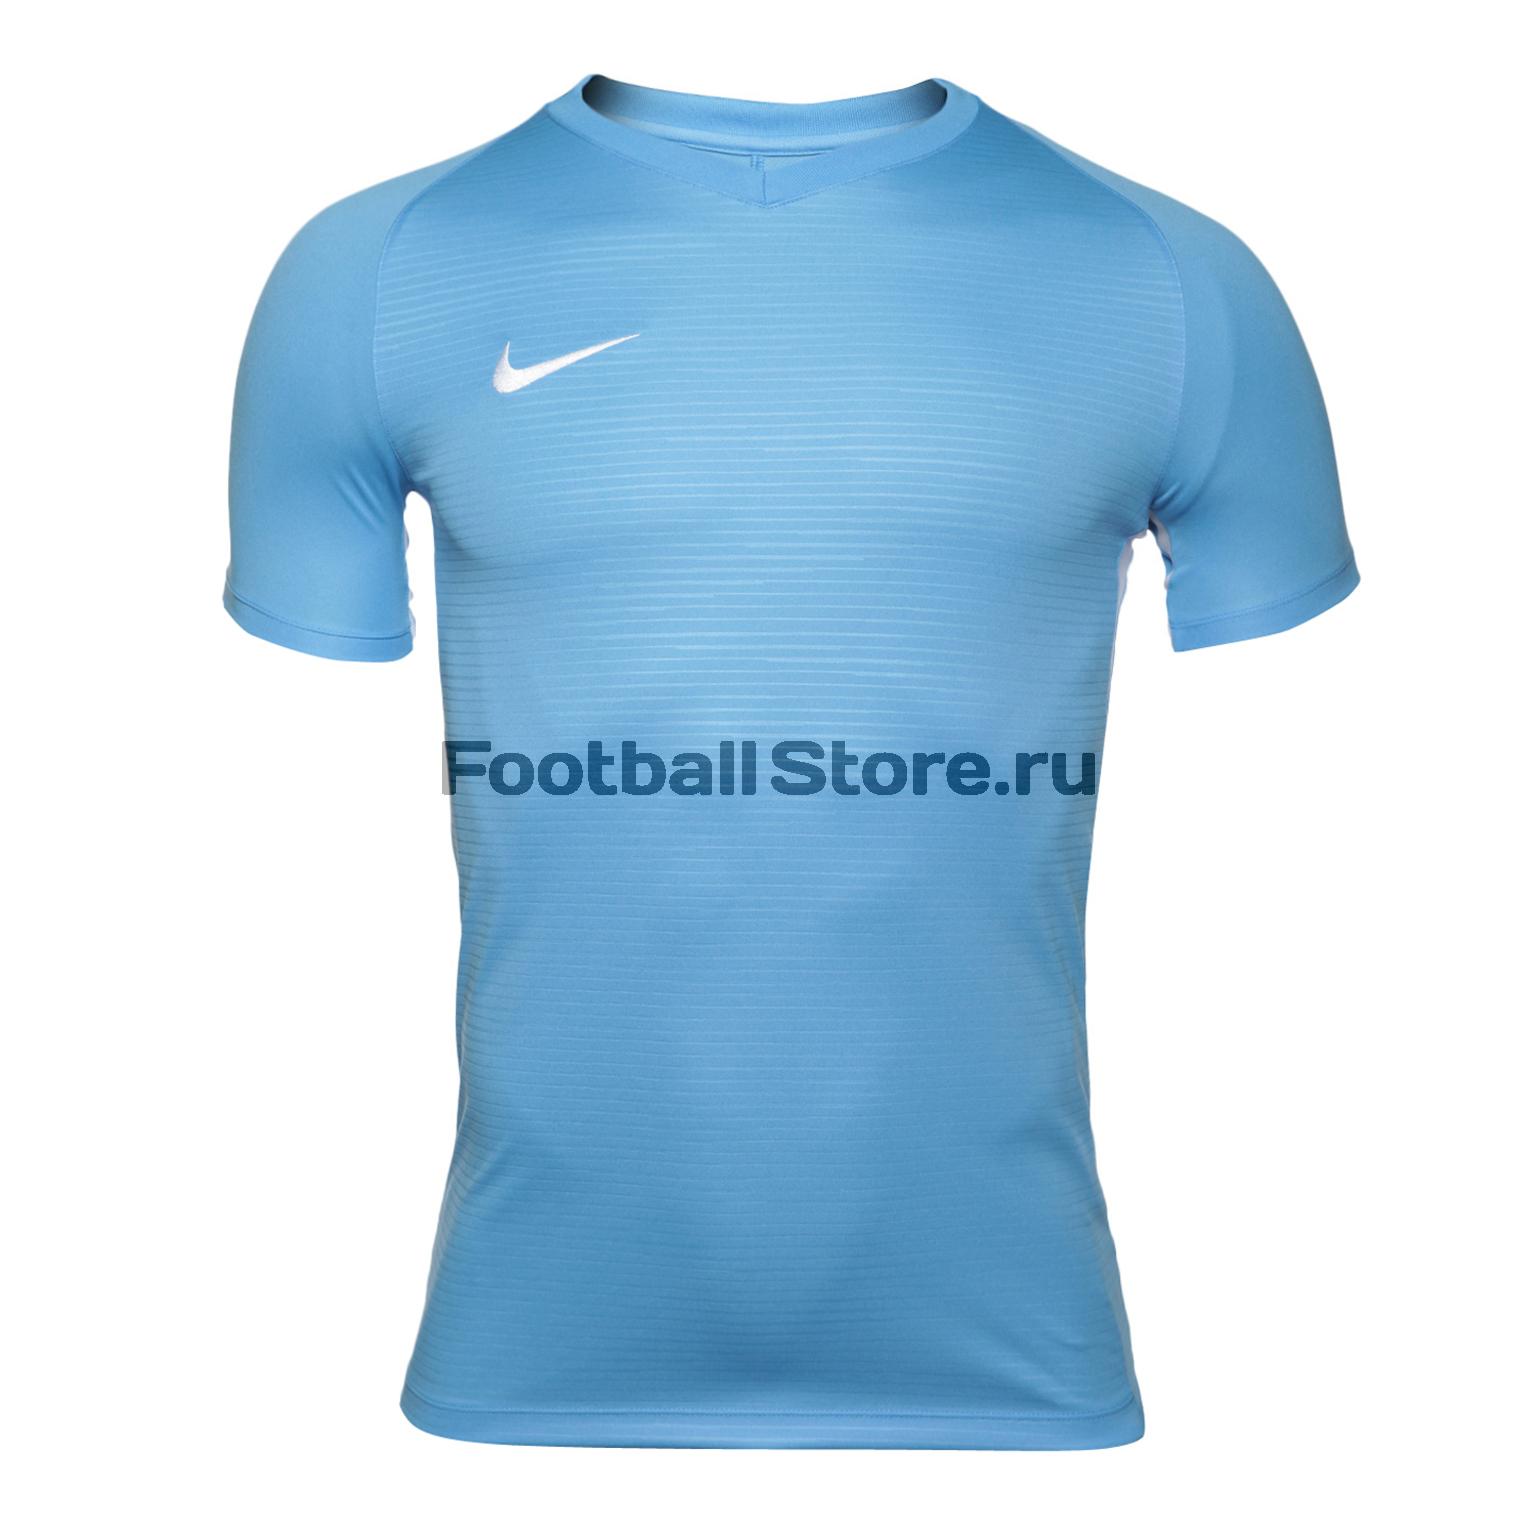 Футболка игровая Nike Dry Tiempo Prem JSY SS 894230-412 футболка игровая nike dry tiempo prem jsy ss 894230 662